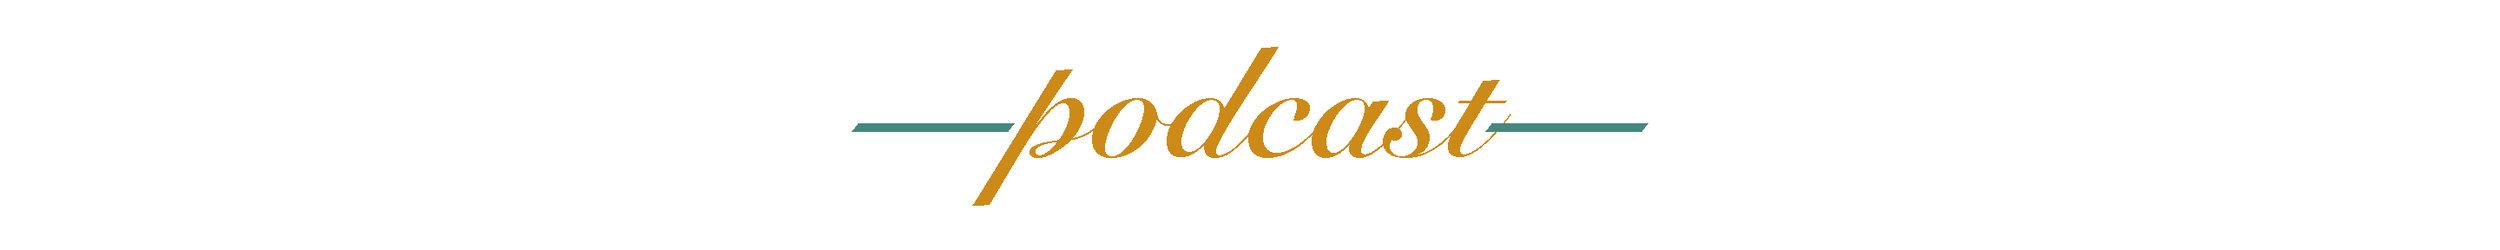 podcast simple.jpg